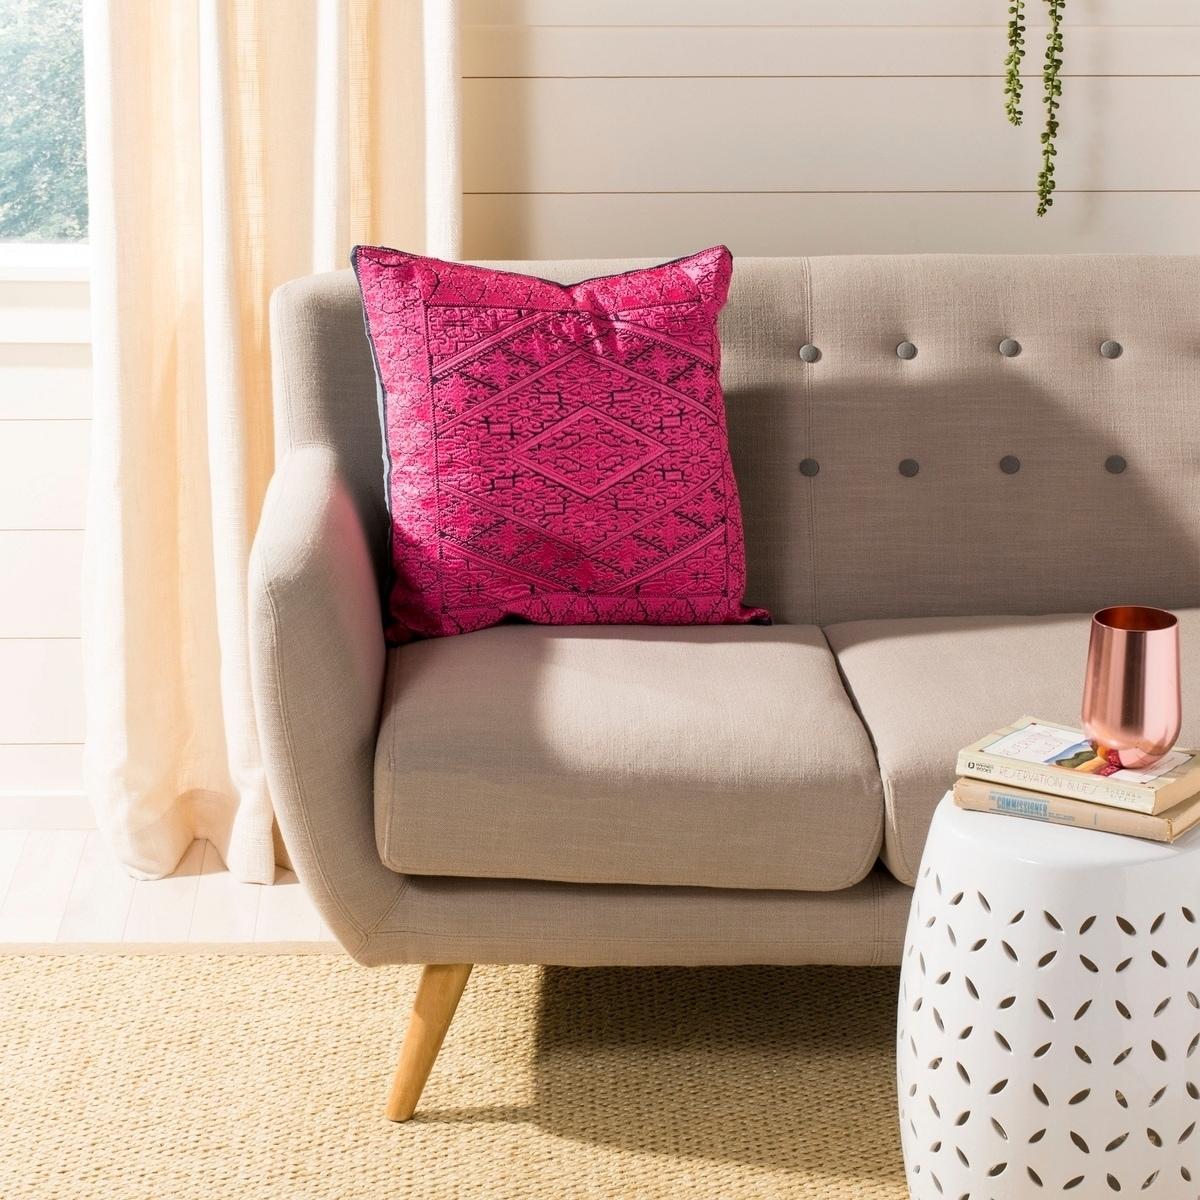 Safavieh Lila Boho Magenta Pink 20 Inch Decorative Pillow Overstock 21497732